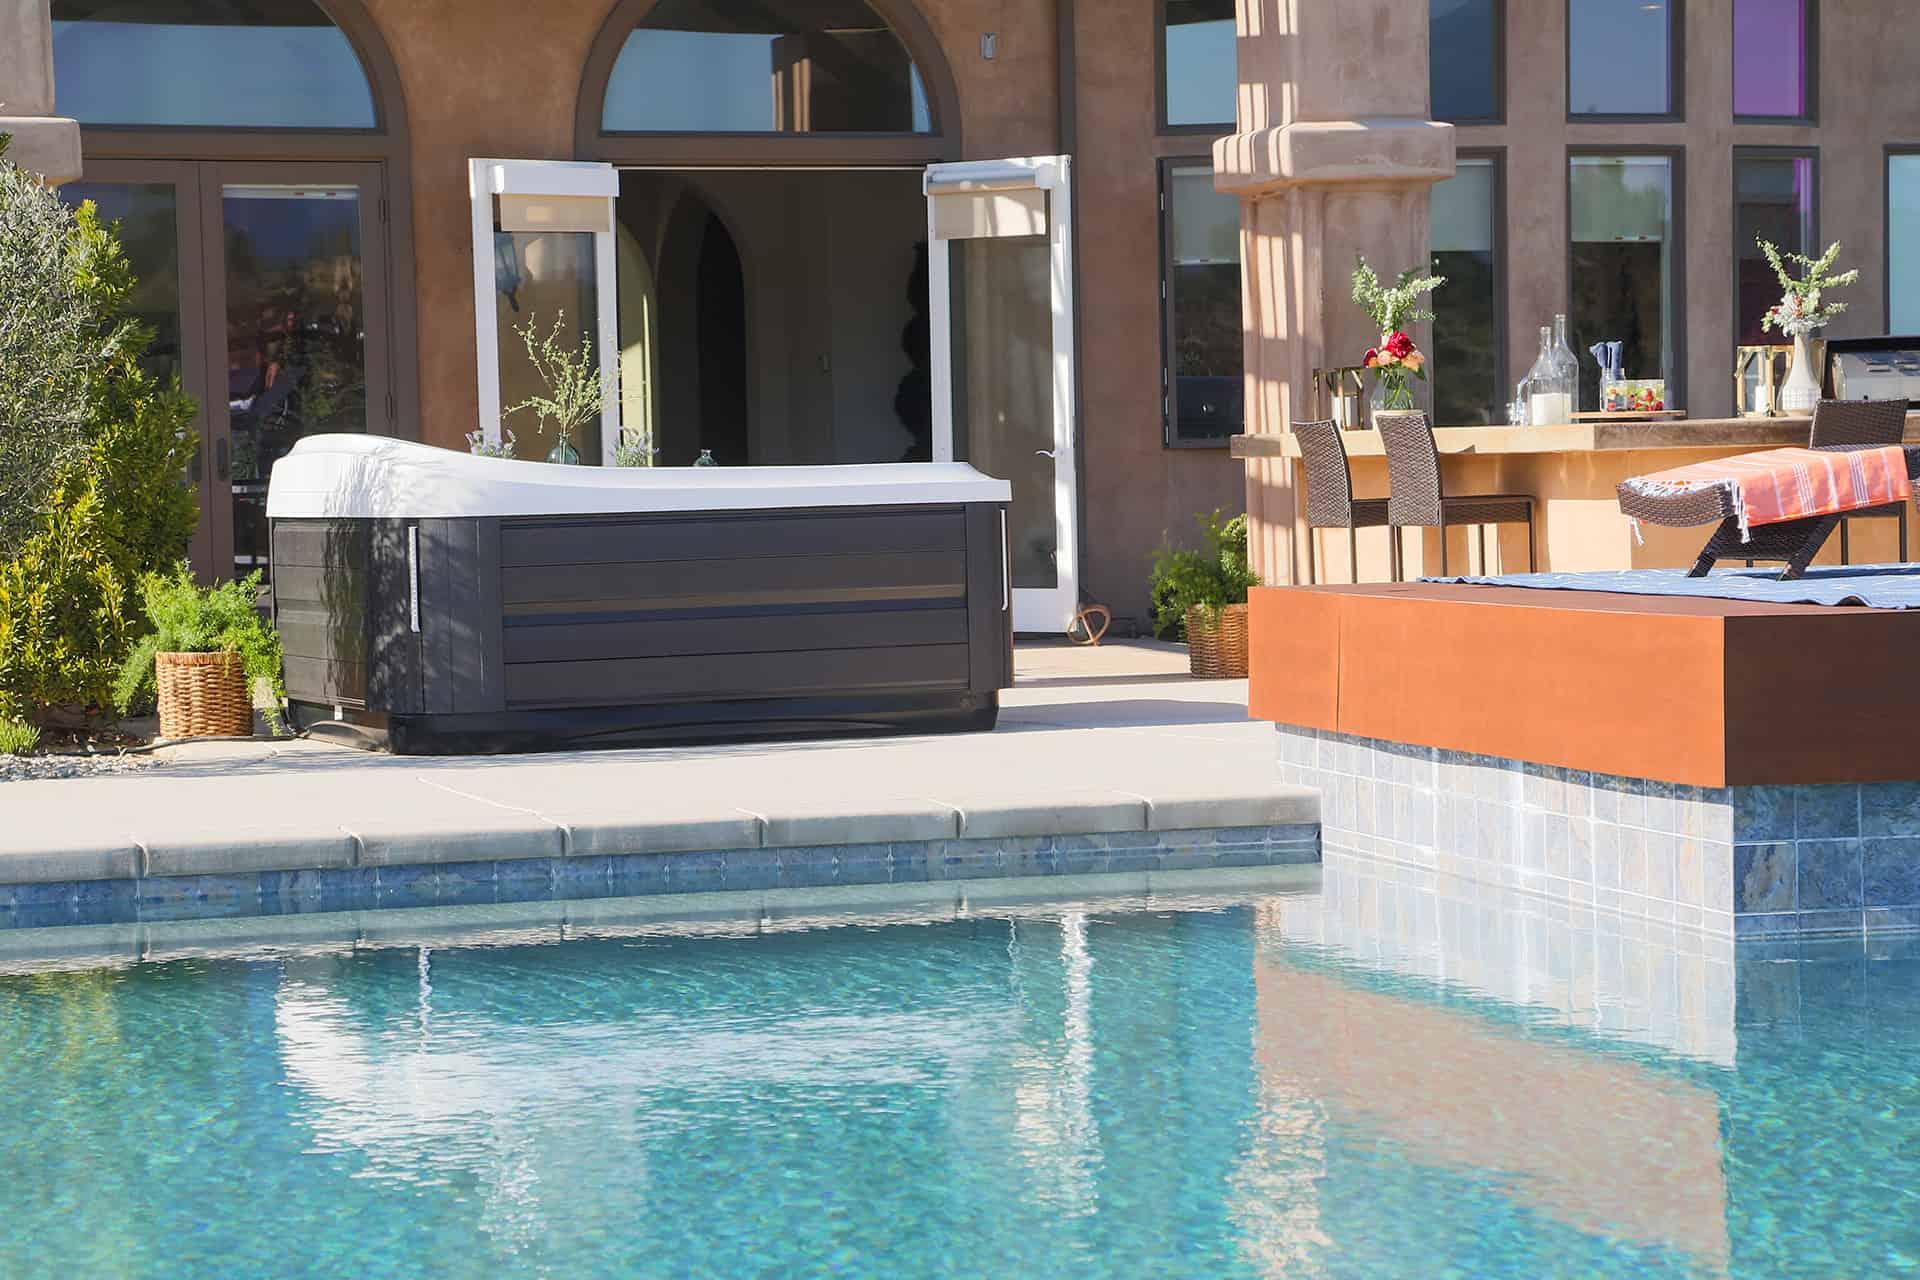 Hot tub and pool backyard setup in Ocala Florida